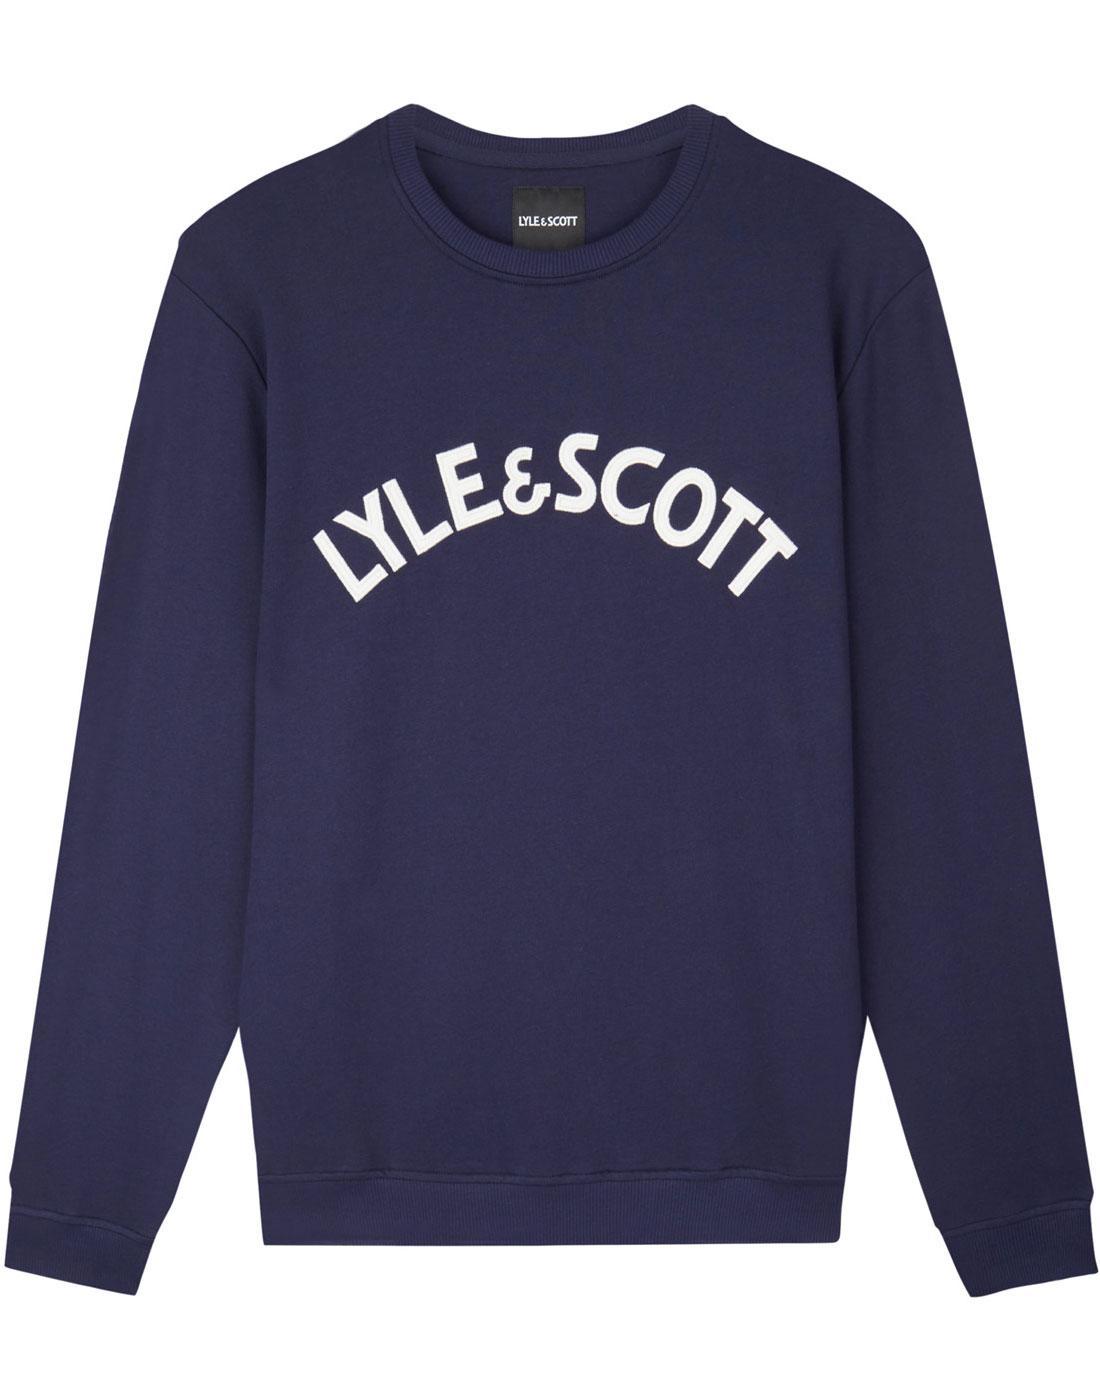 LYLE & SCOTT Men's Retro 70s Varsity Sweatshirt